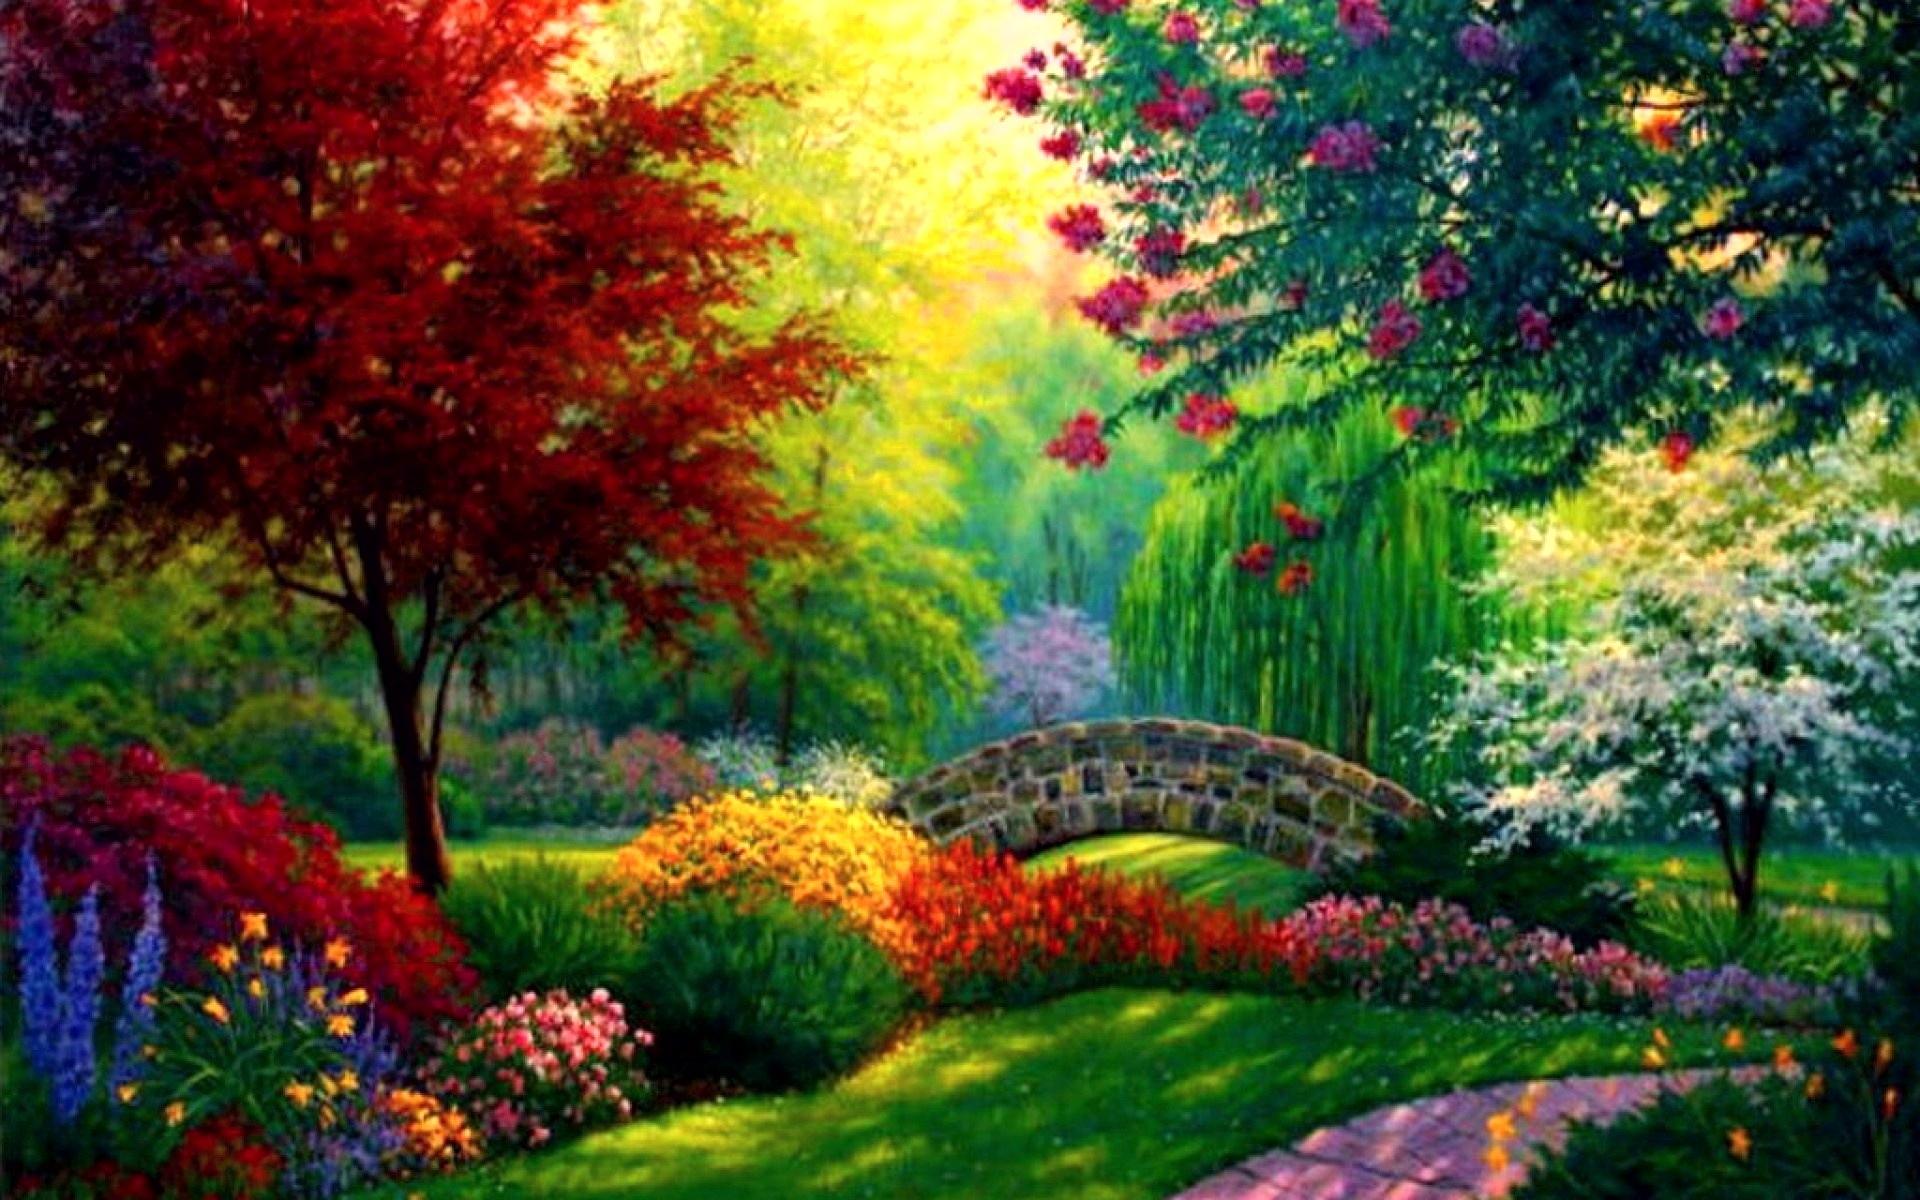 Beautiful Nature Hd Wallpapers For Desktop 1920x1200